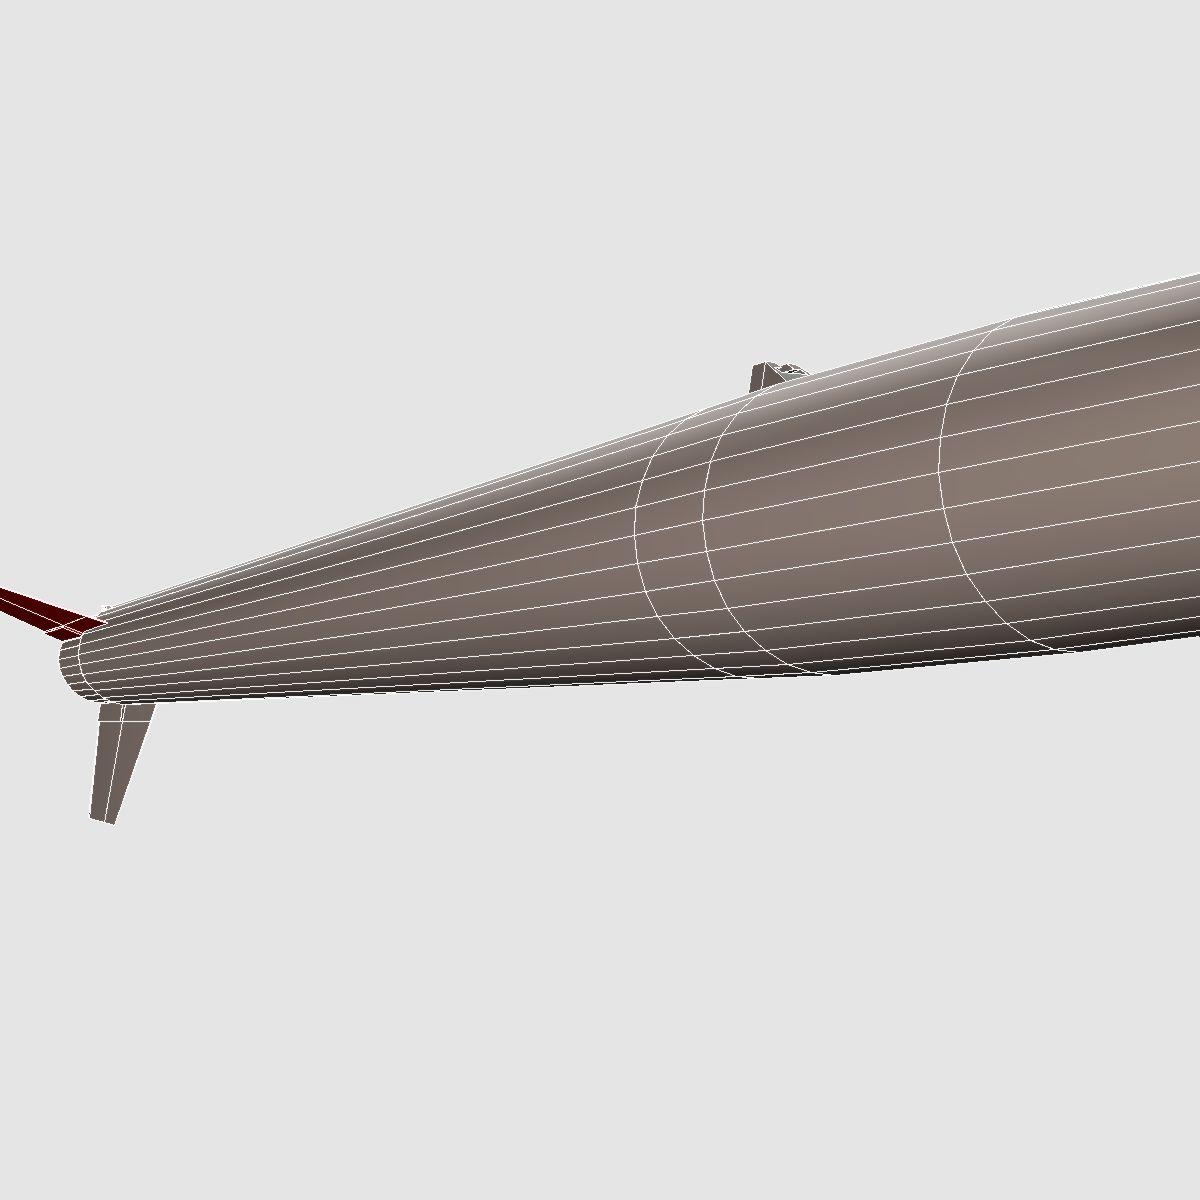 black brant vb sounding rocket 3d model 3ds dxf cob x obj 150882